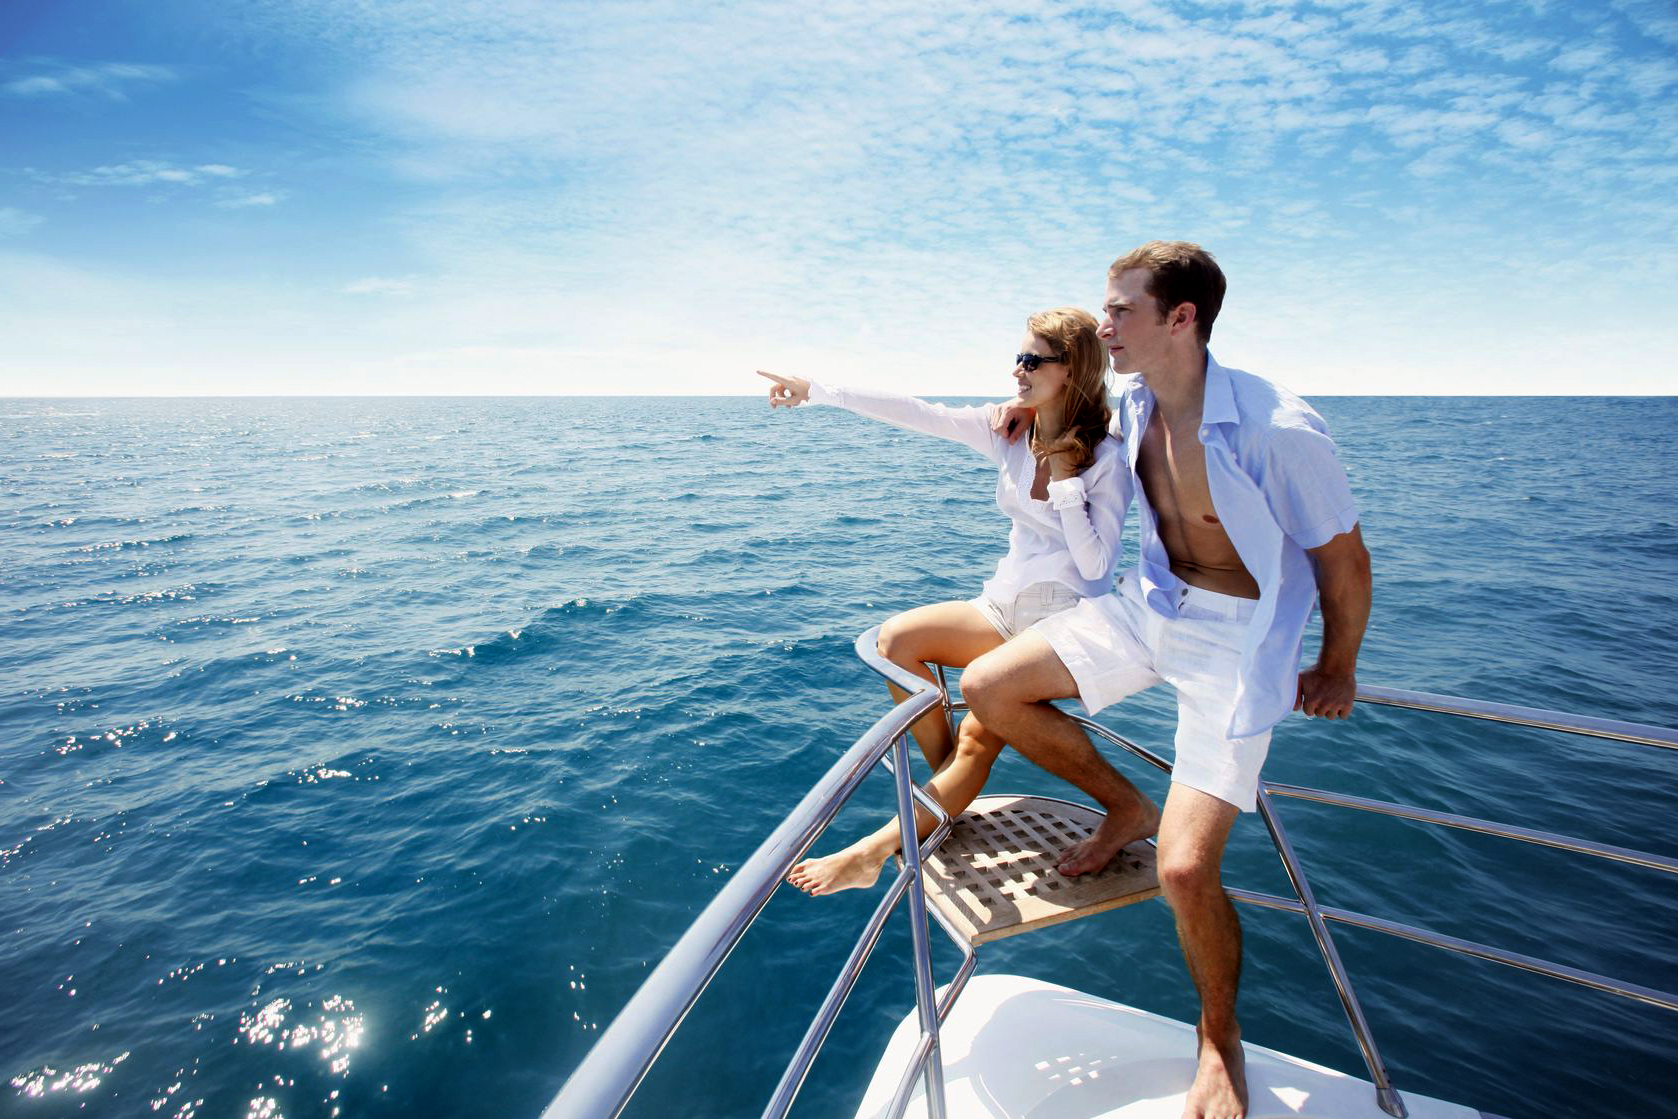 http://www.italianluxuryboat.com